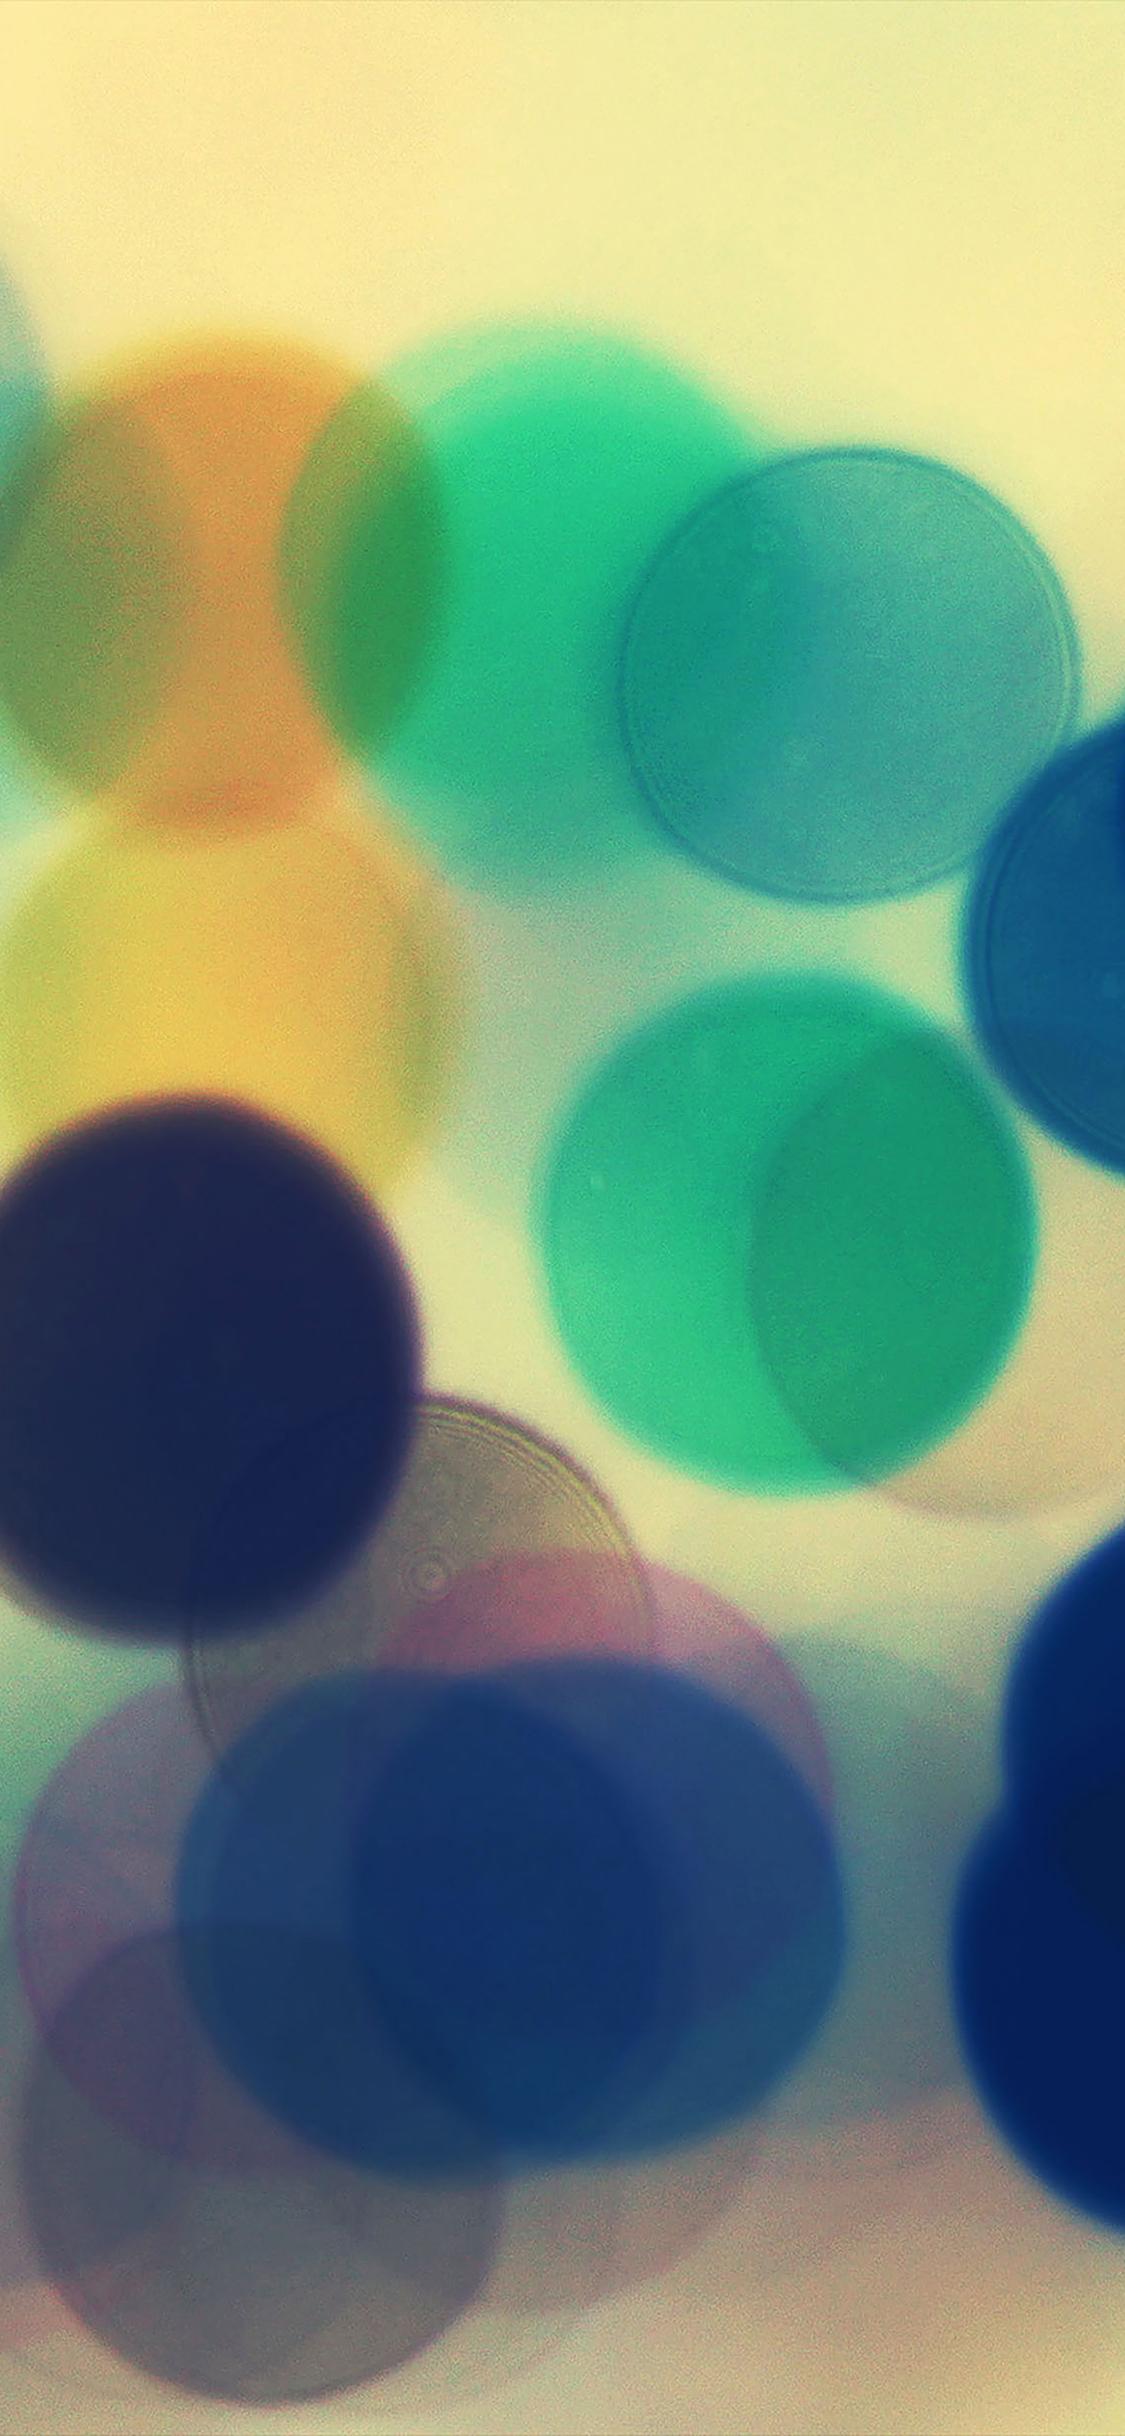 iPhoneXpapers.com-Apple-iPhone-wallpaper-va41-blurred-lines-b-bokeh-pattern